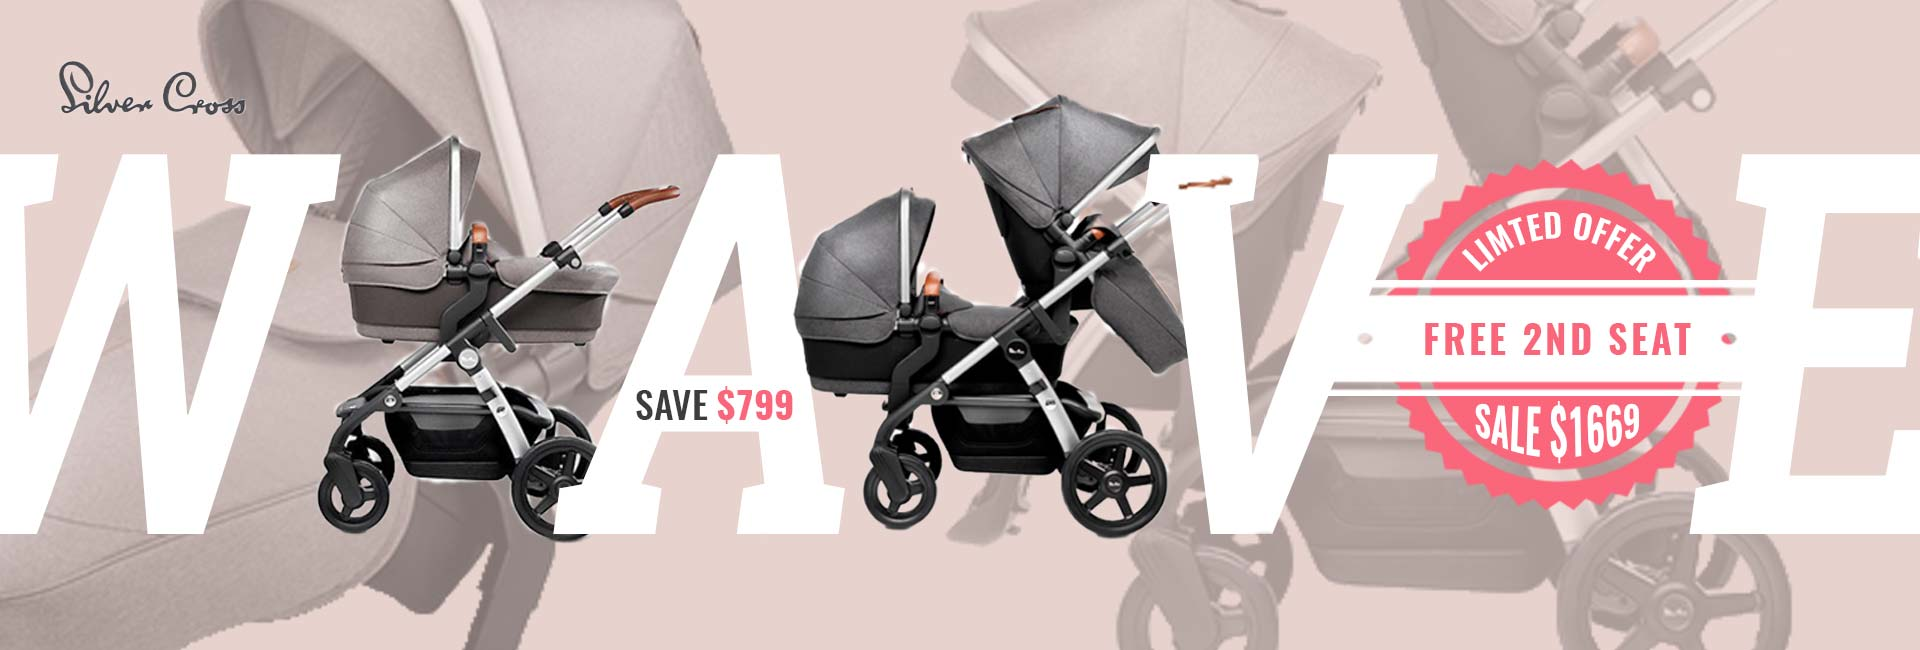 silver cross wave exclusive sale  $1669